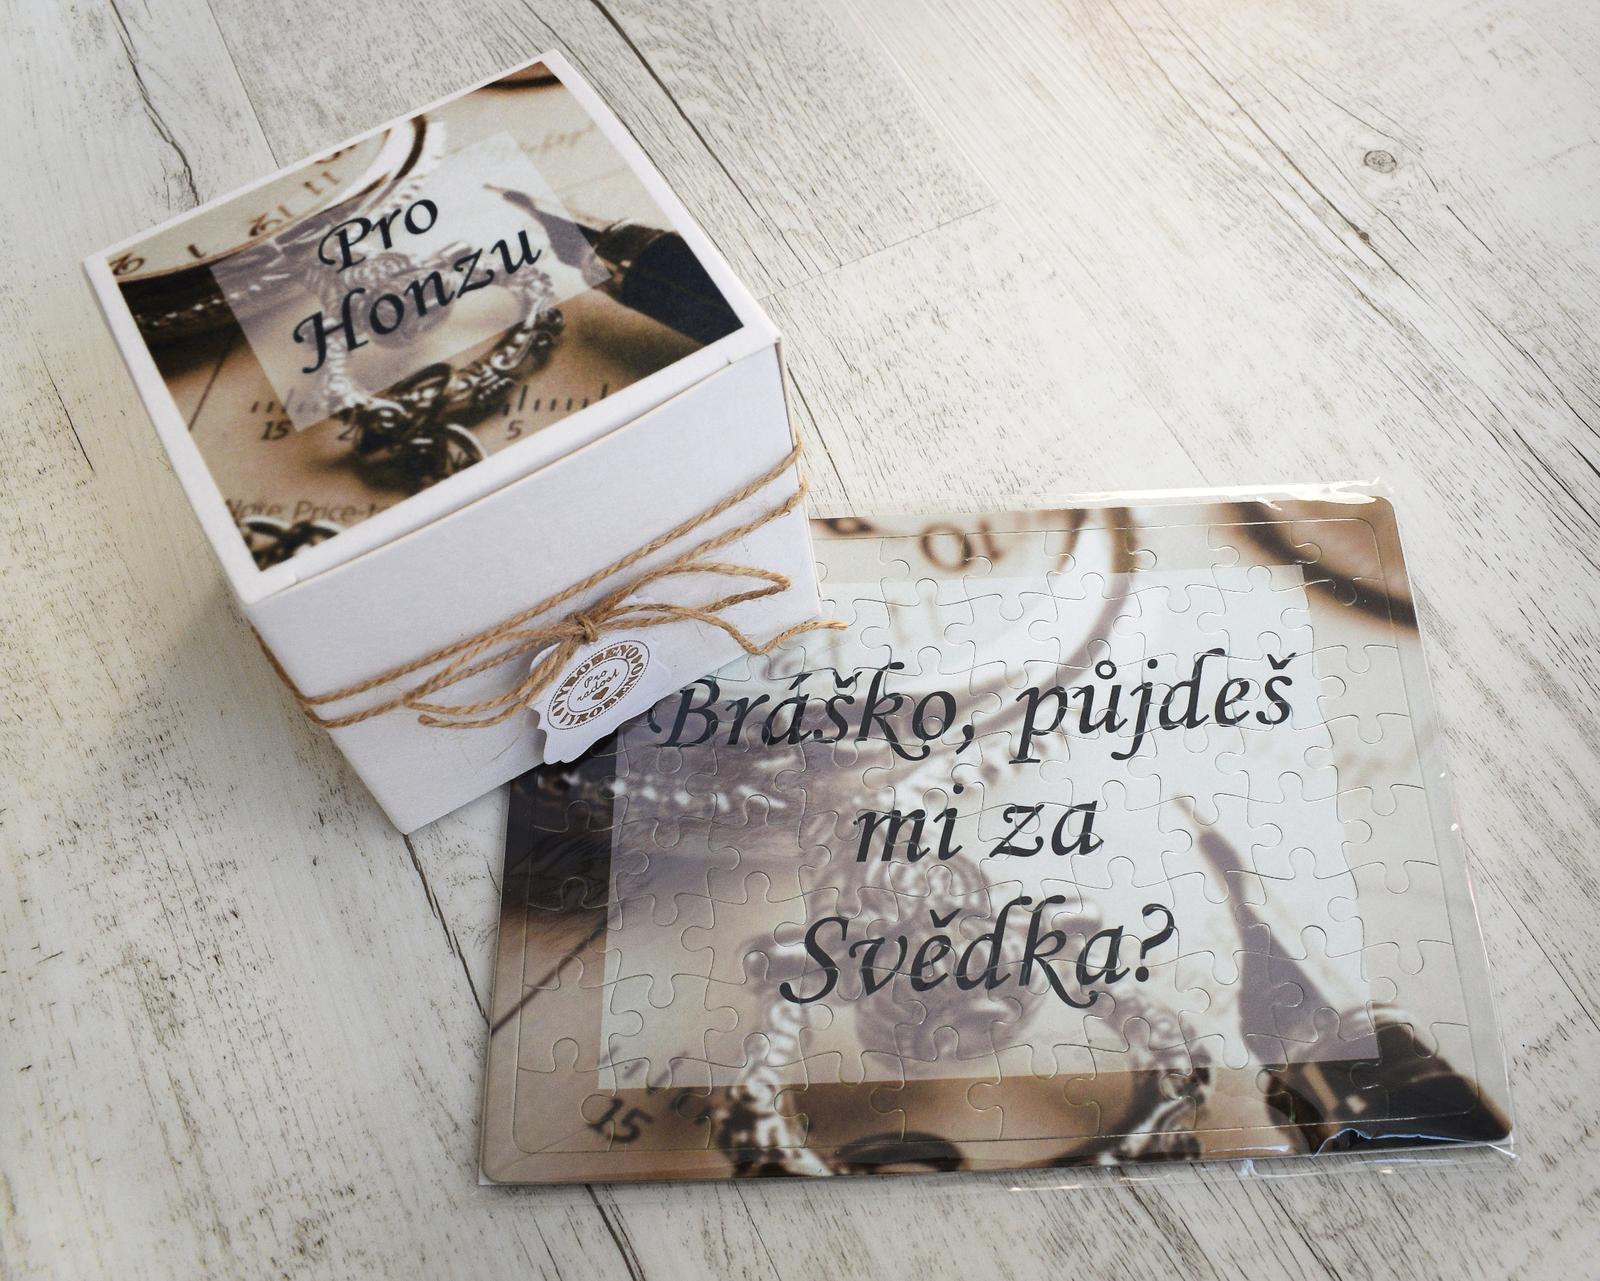 erika_rekniano - puzzle s krabičkou pro svědka